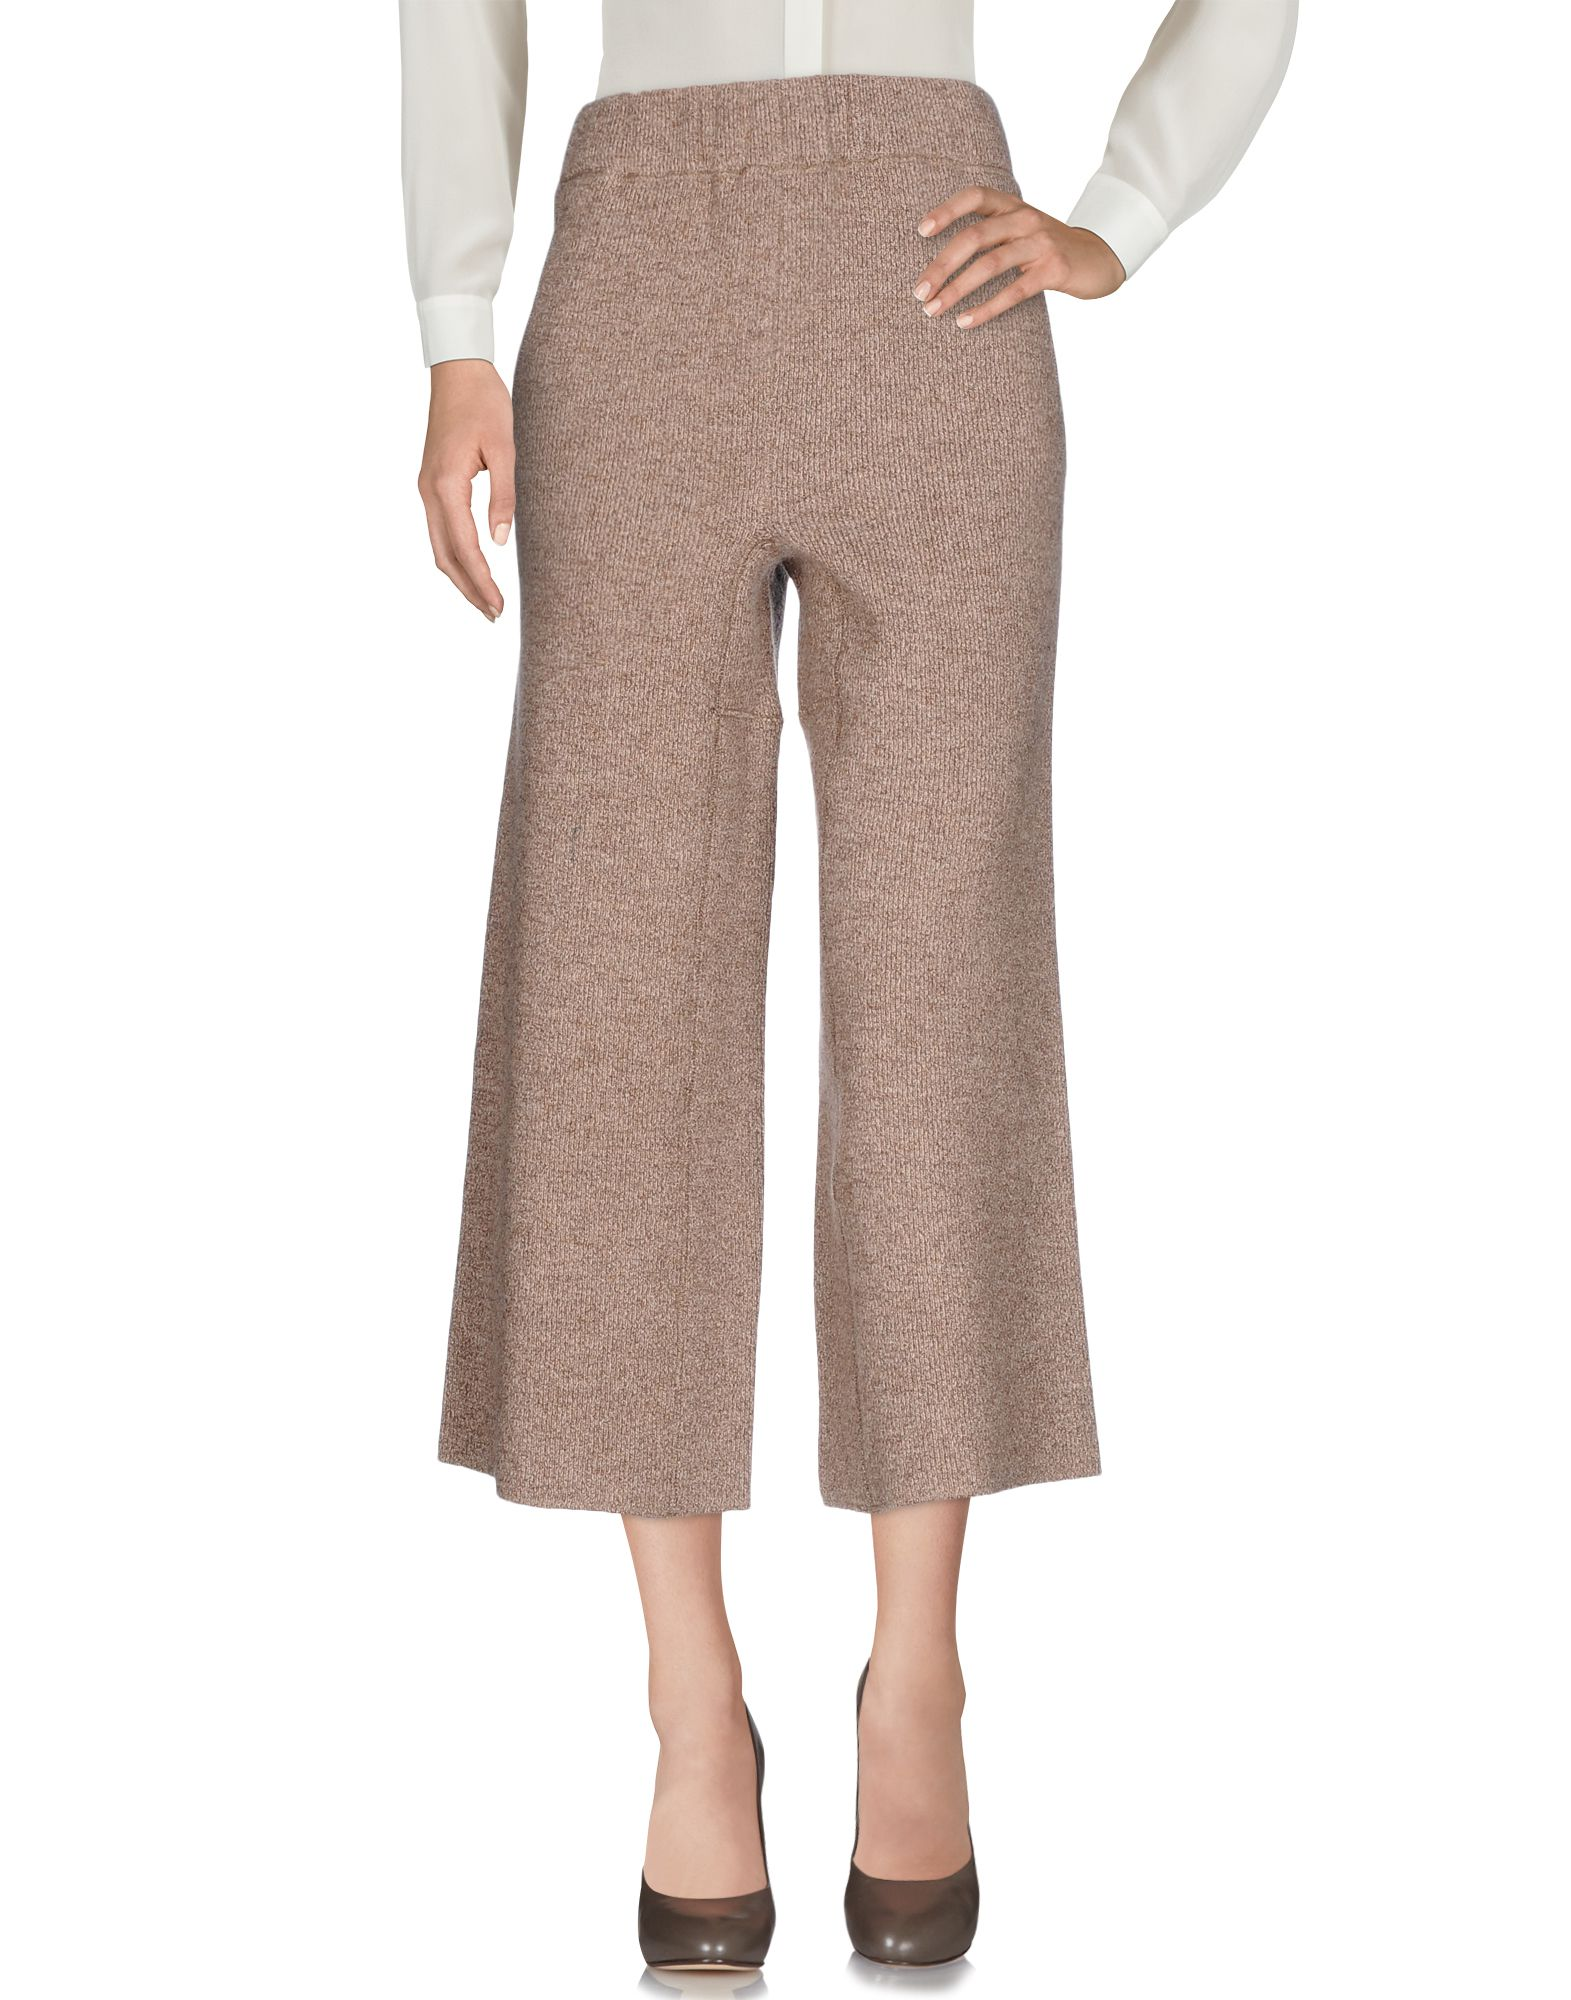 LUCIO VANOTTI Damen Hose Farbe Khaki Größe 4 jetztbilligerkaufen